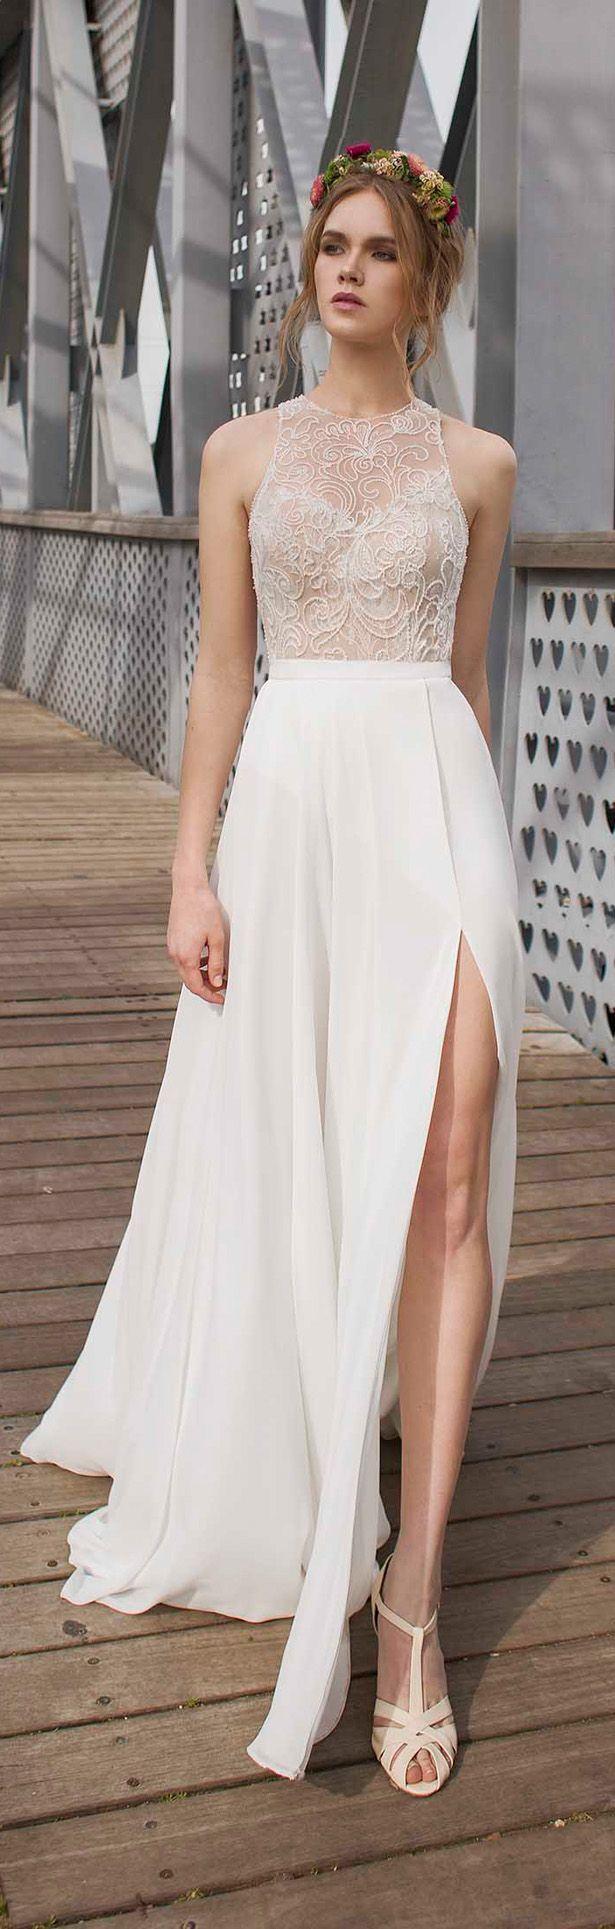 Vestidos largos elegantes para playa